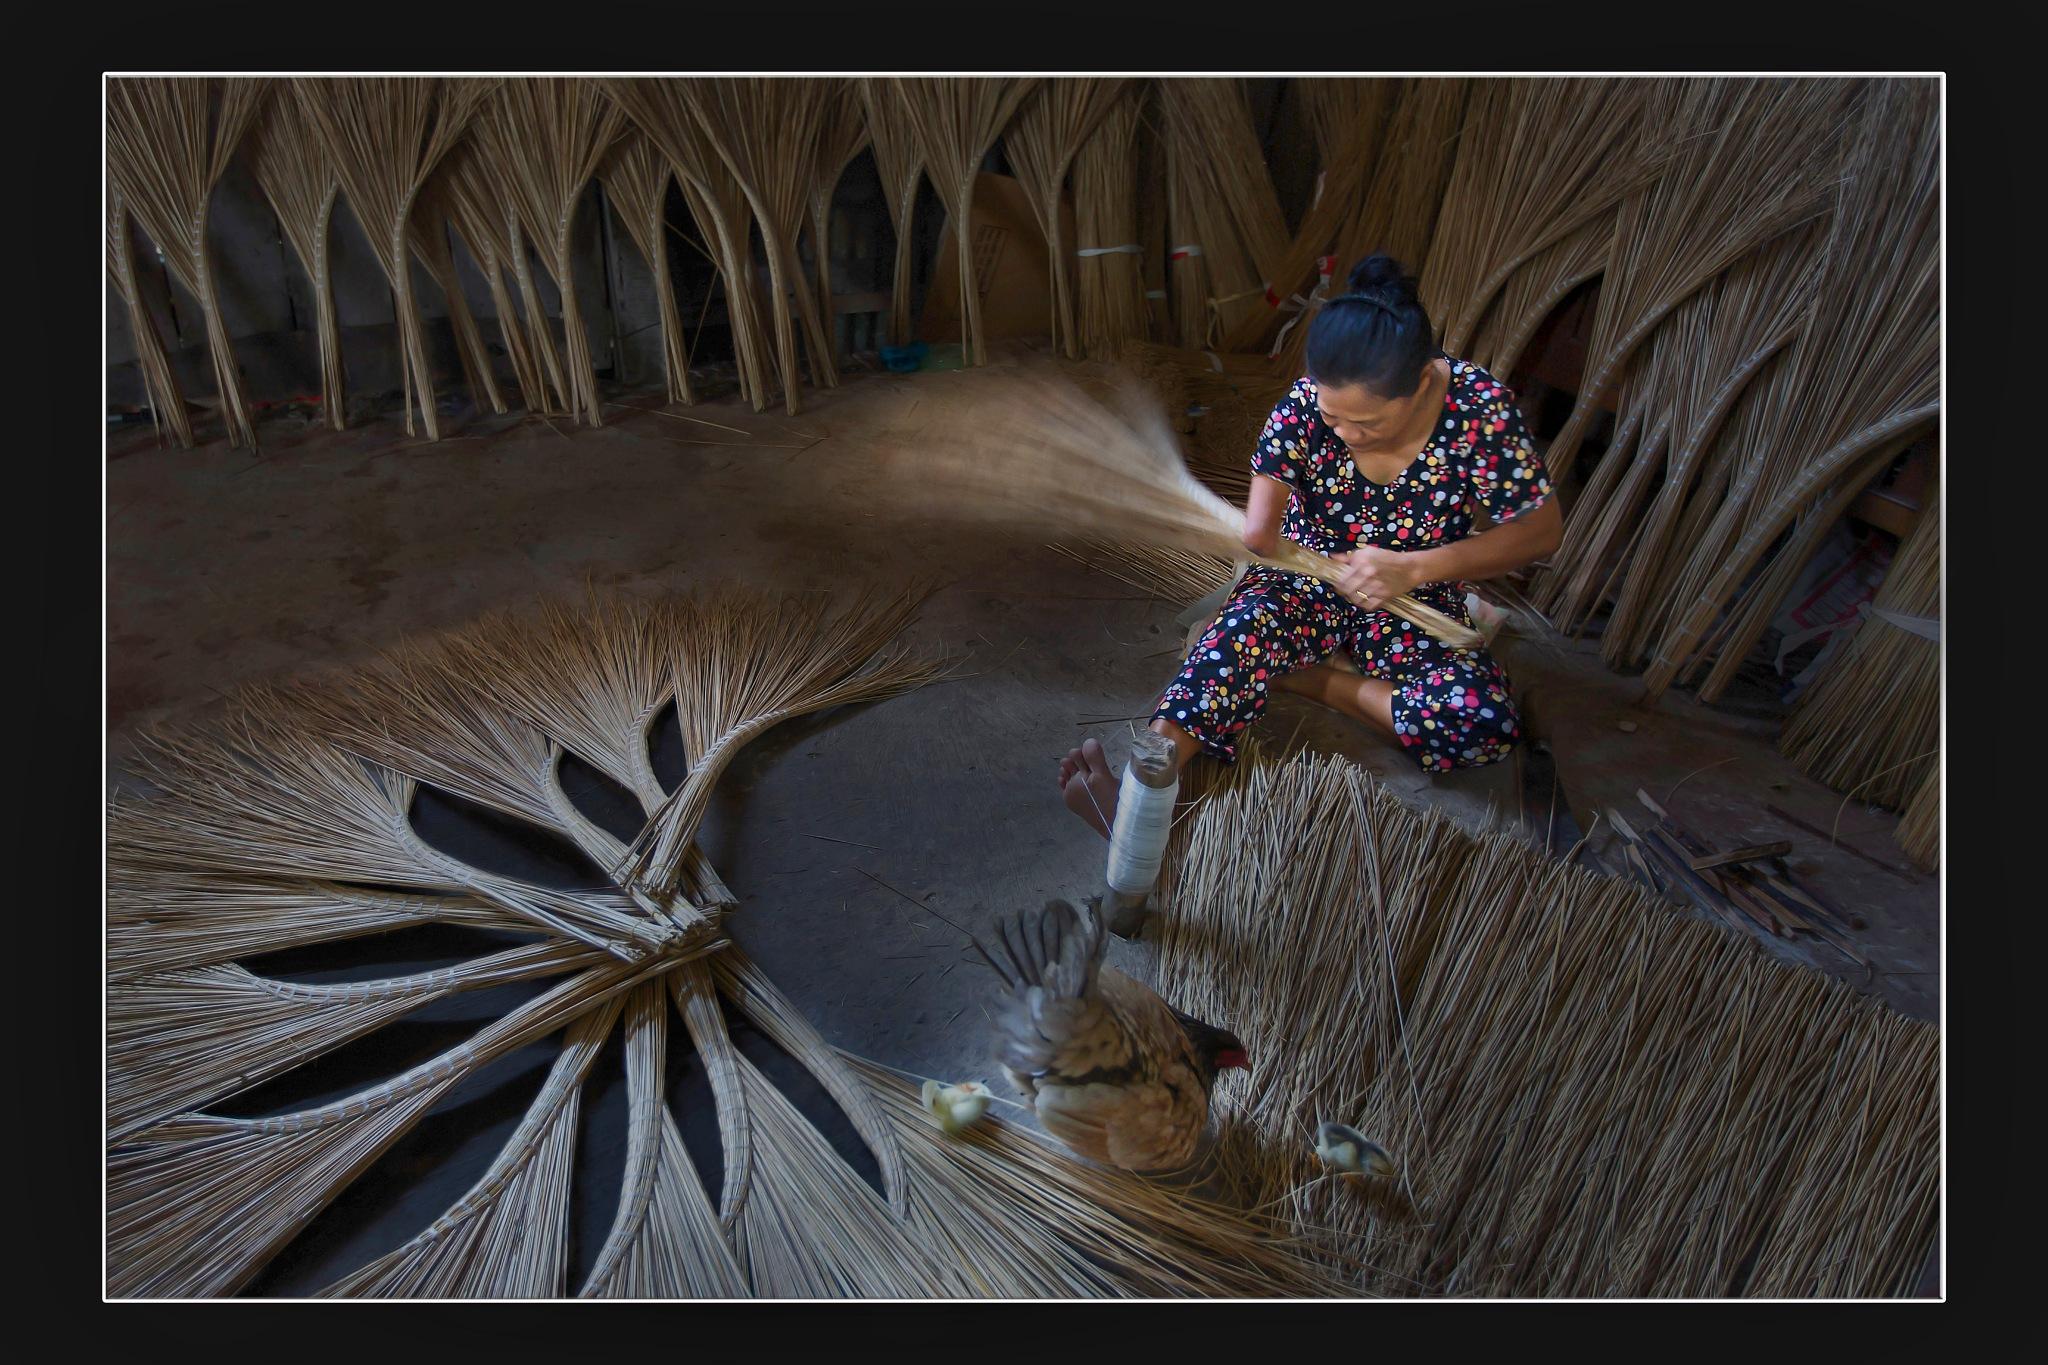 Bó Chổi by thaison